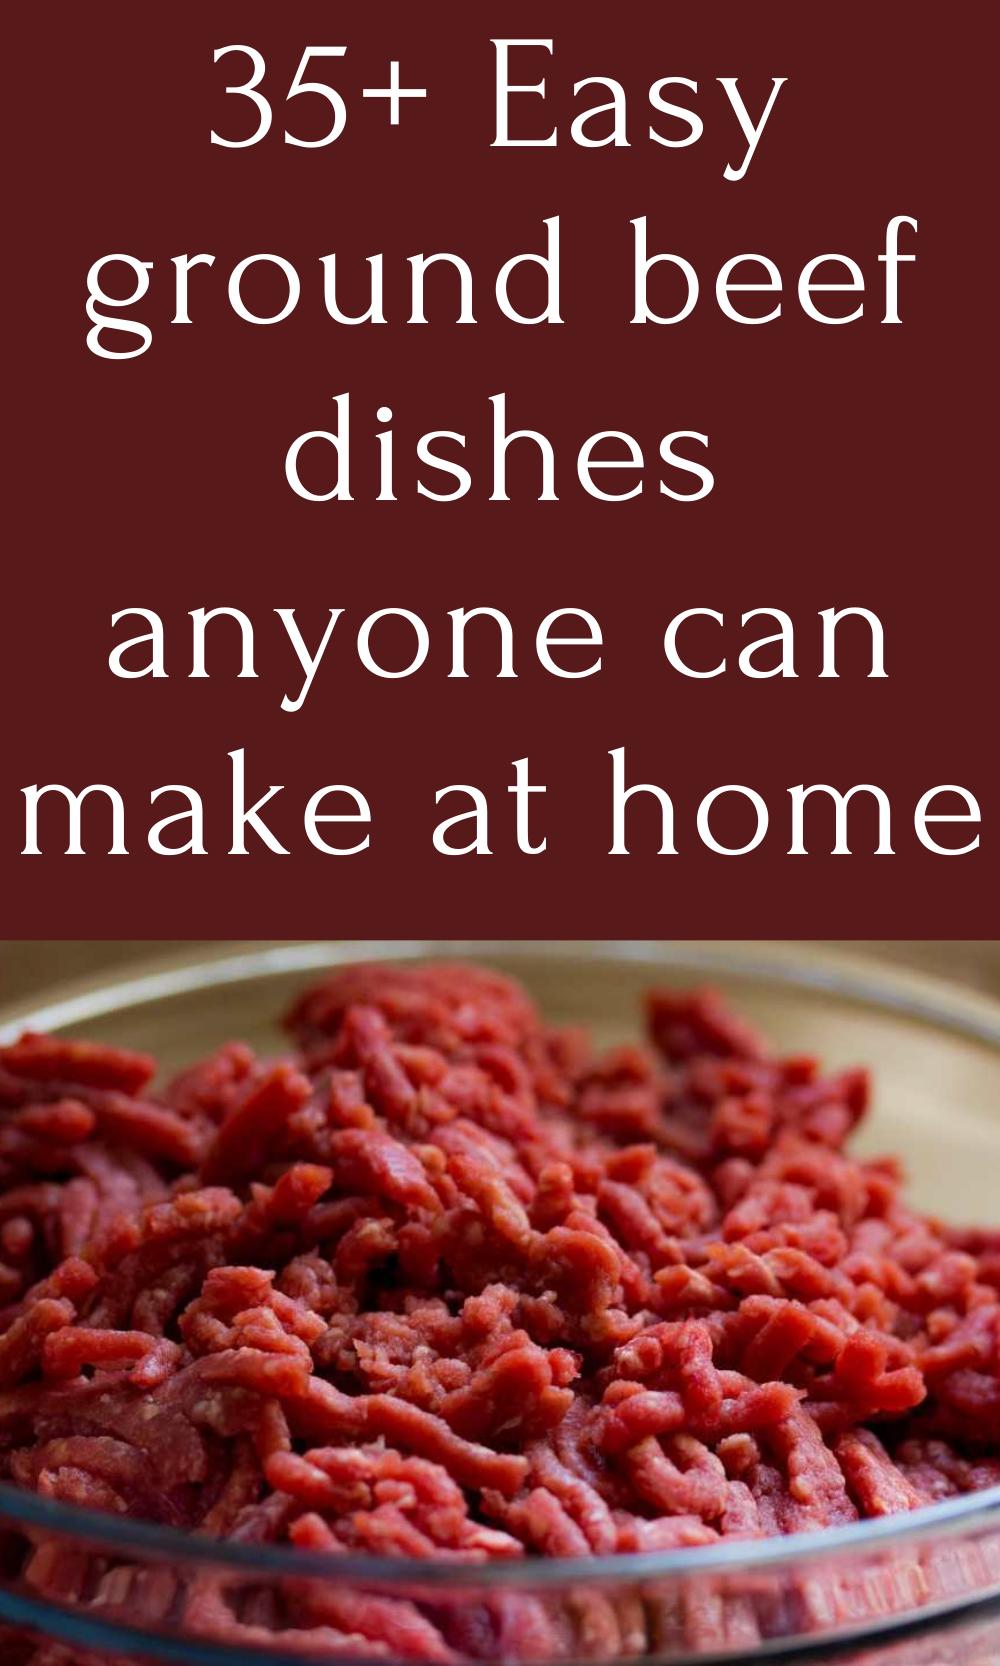 35 Easy Ground Beef Dishes Anyone Can Make At Home Diy Food Diy Life Diy Cricut